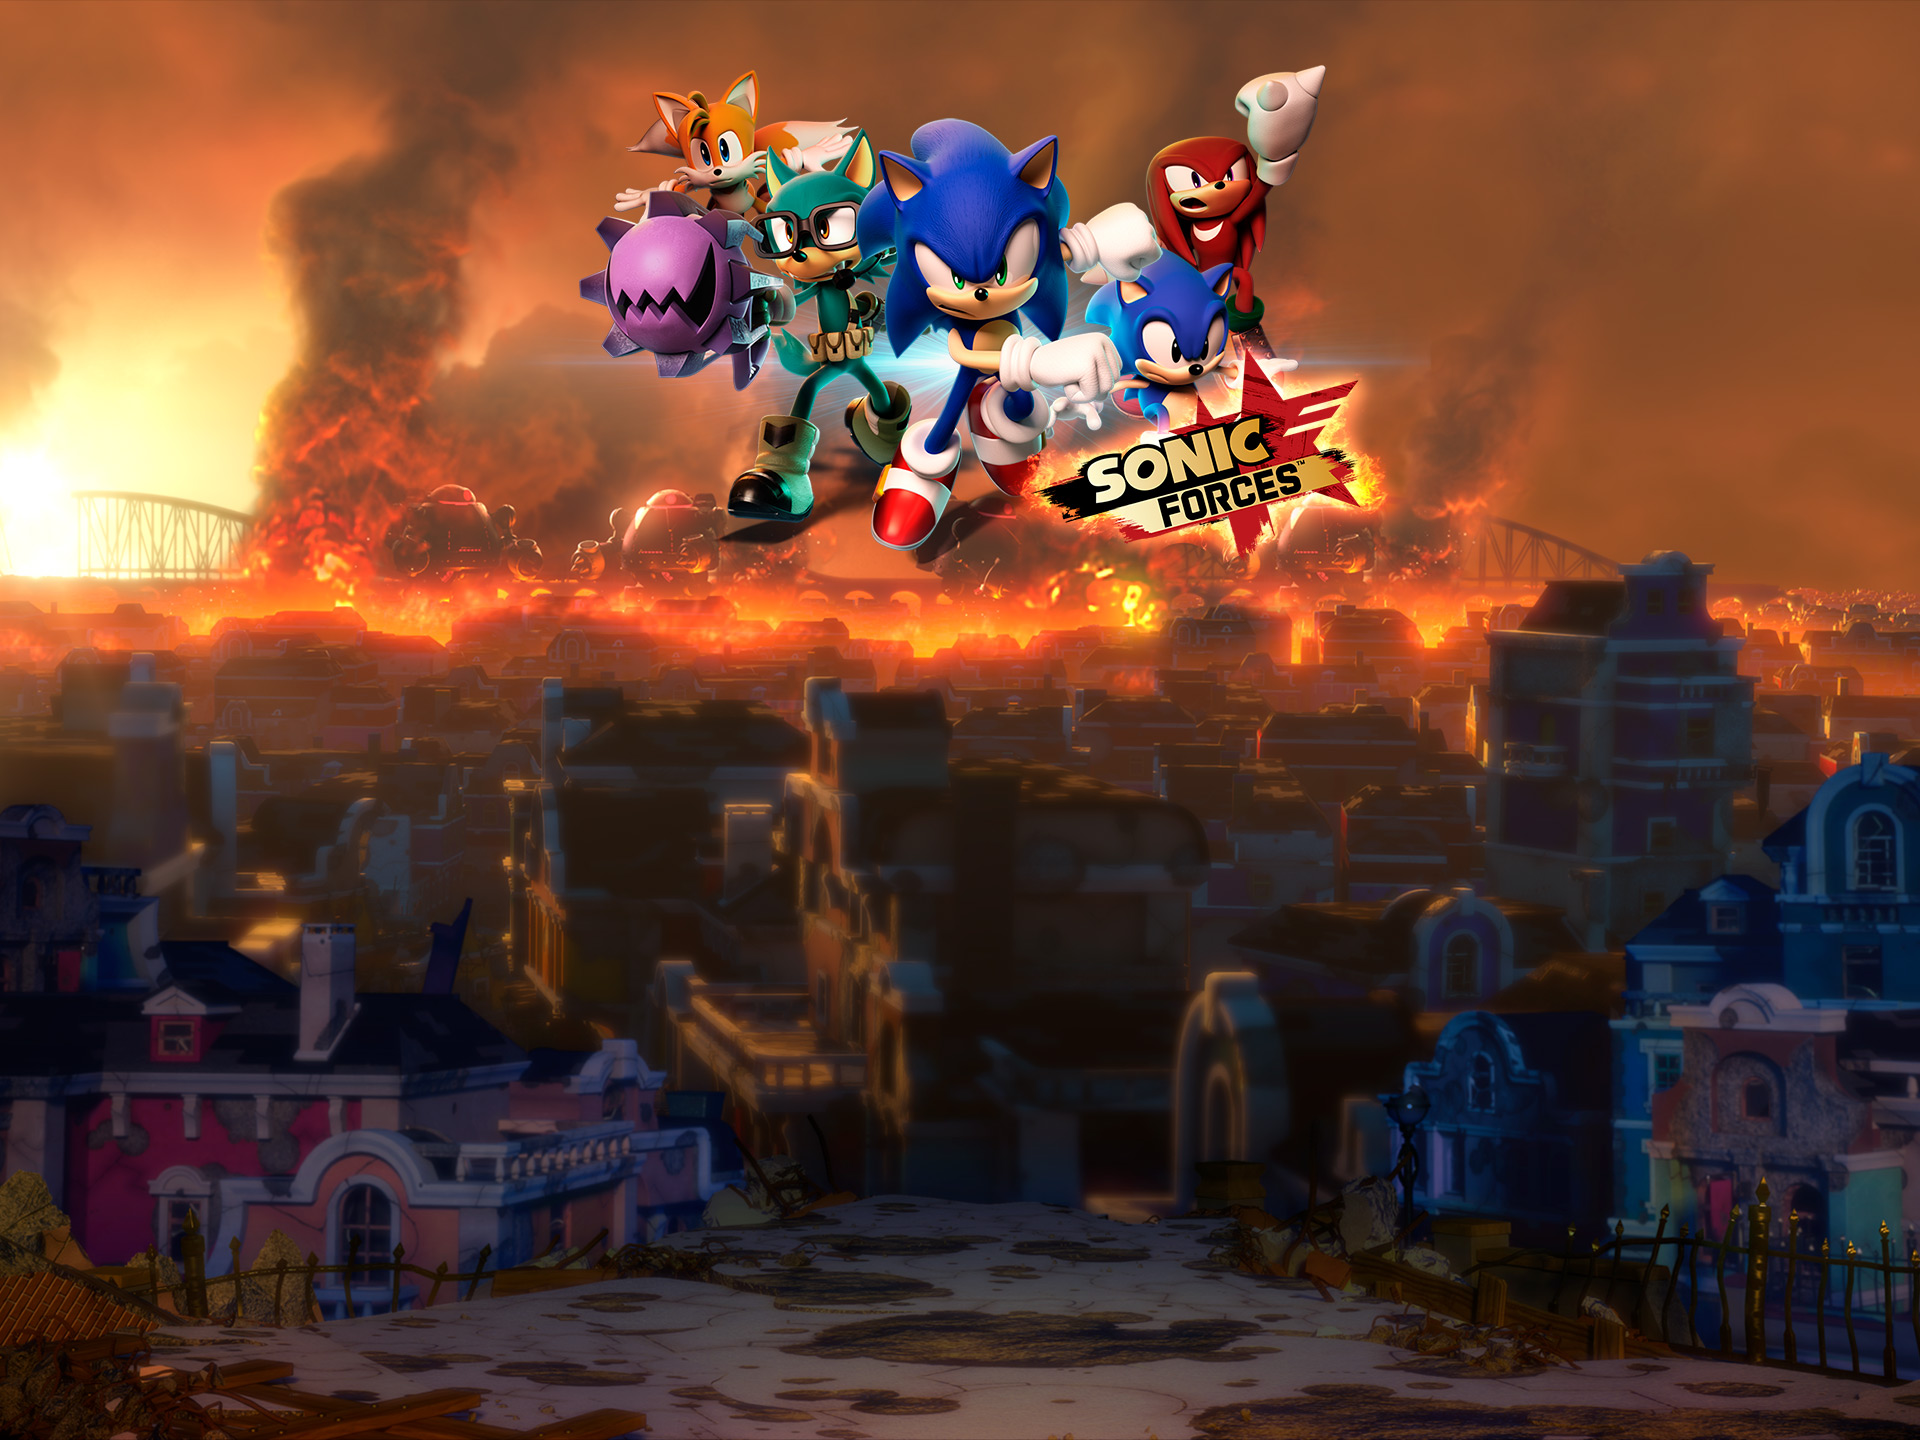 Sonic Forces Wallpapers Wallpapersafari